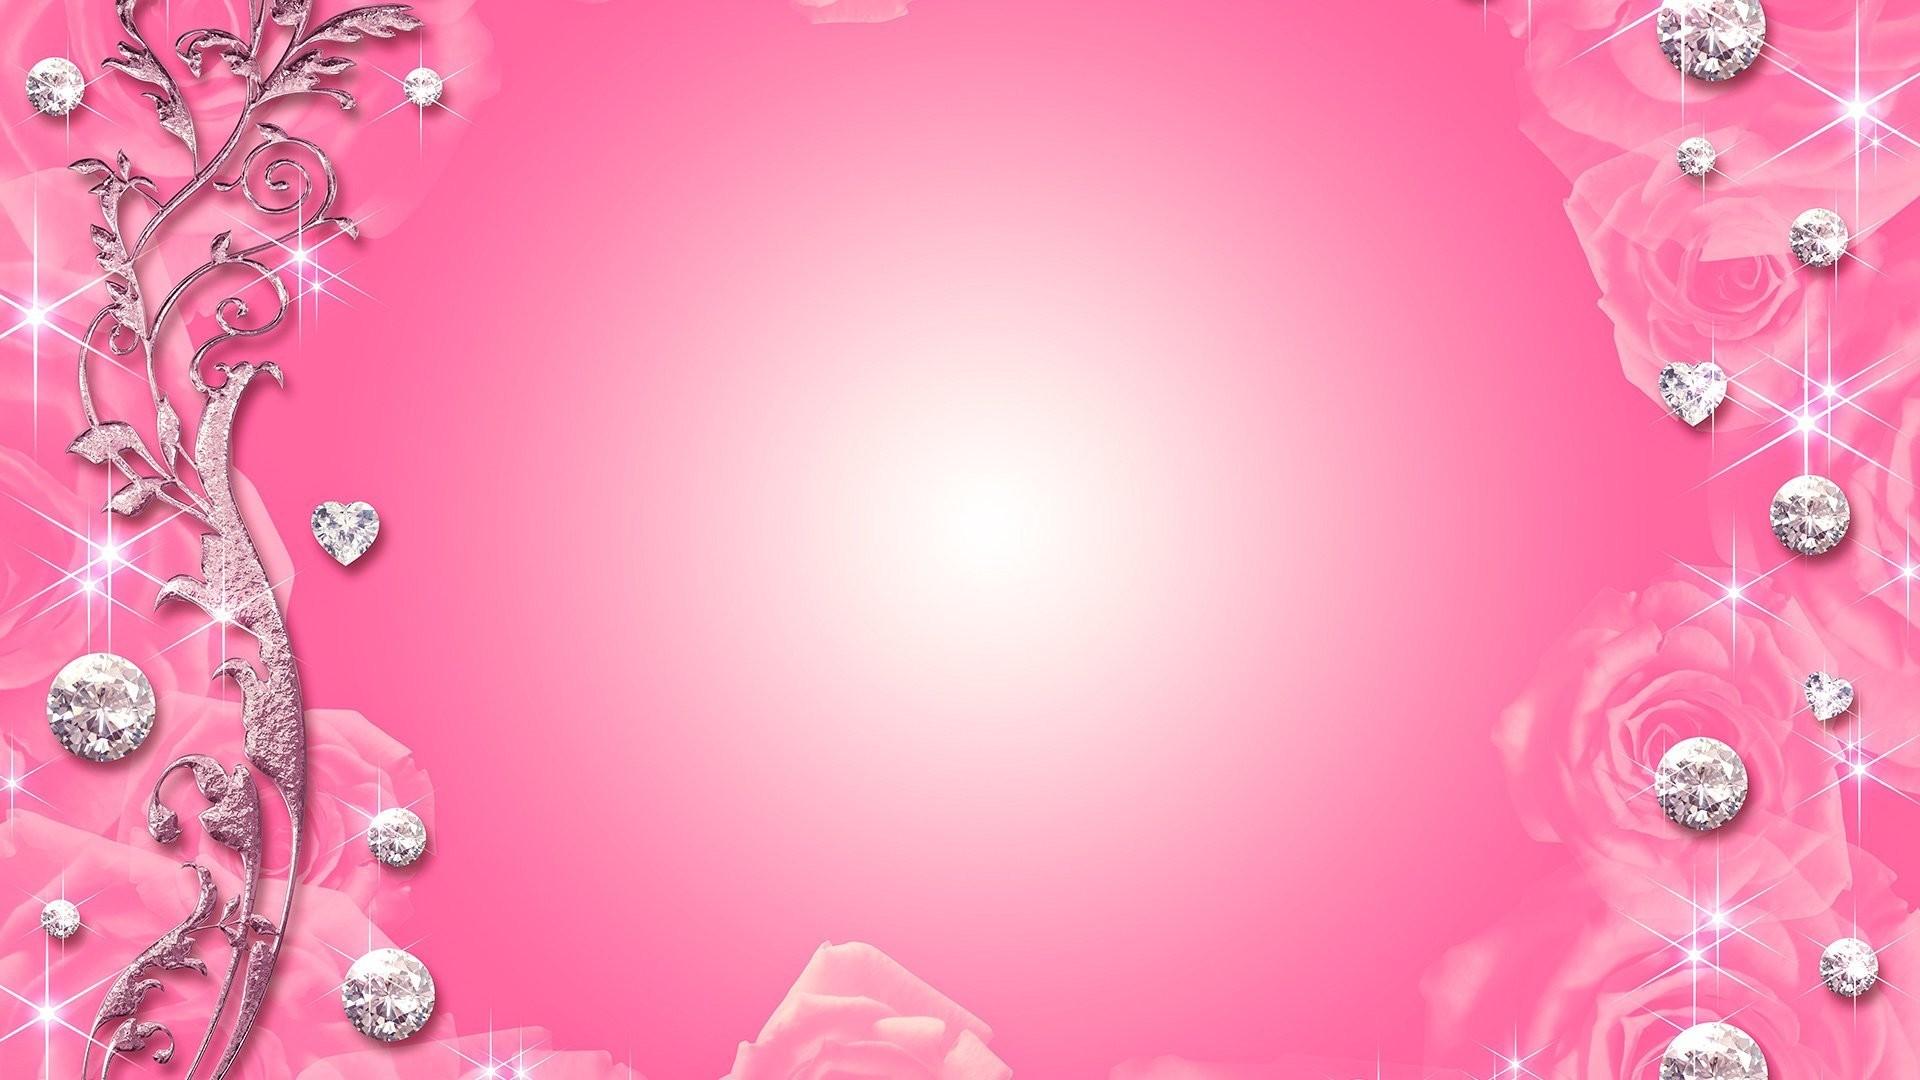 Pink wallpaper 24 1920x1080